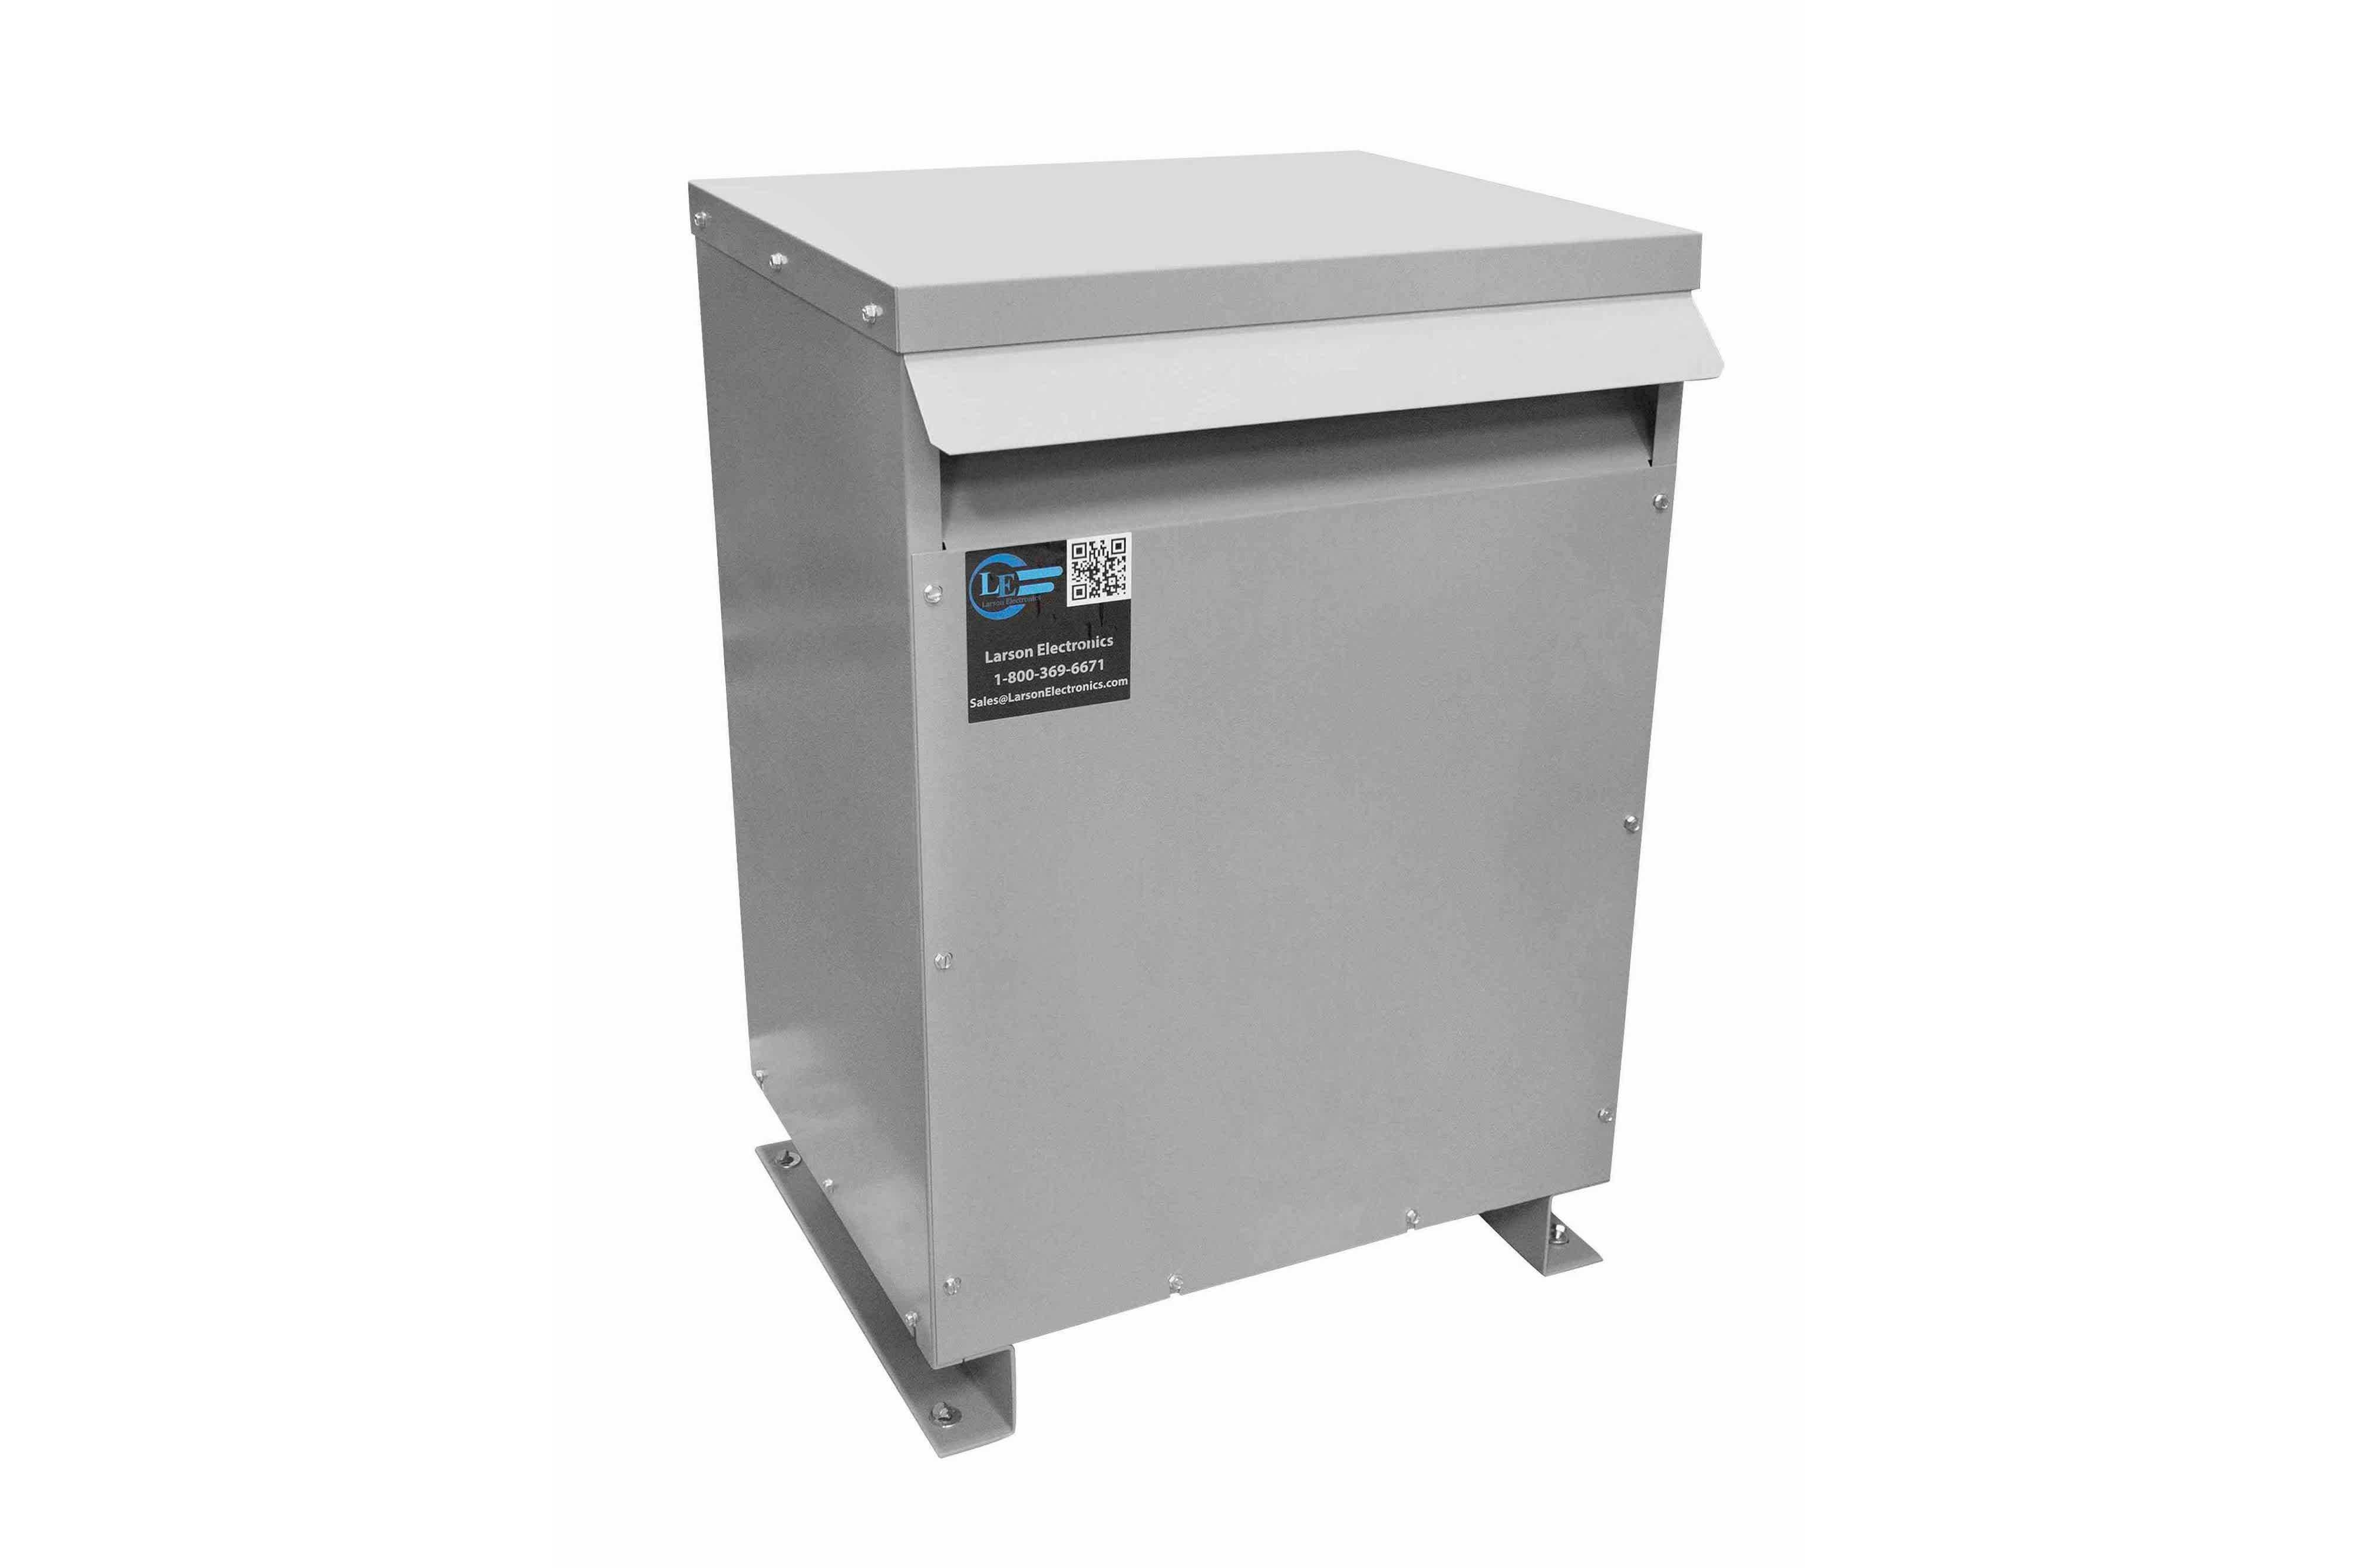 750 kVA 3PH DOE Transformer, 575V Delta Primary, 380Y/220 Wye-N Secondary, N3R, Ventilated, 60 Hz